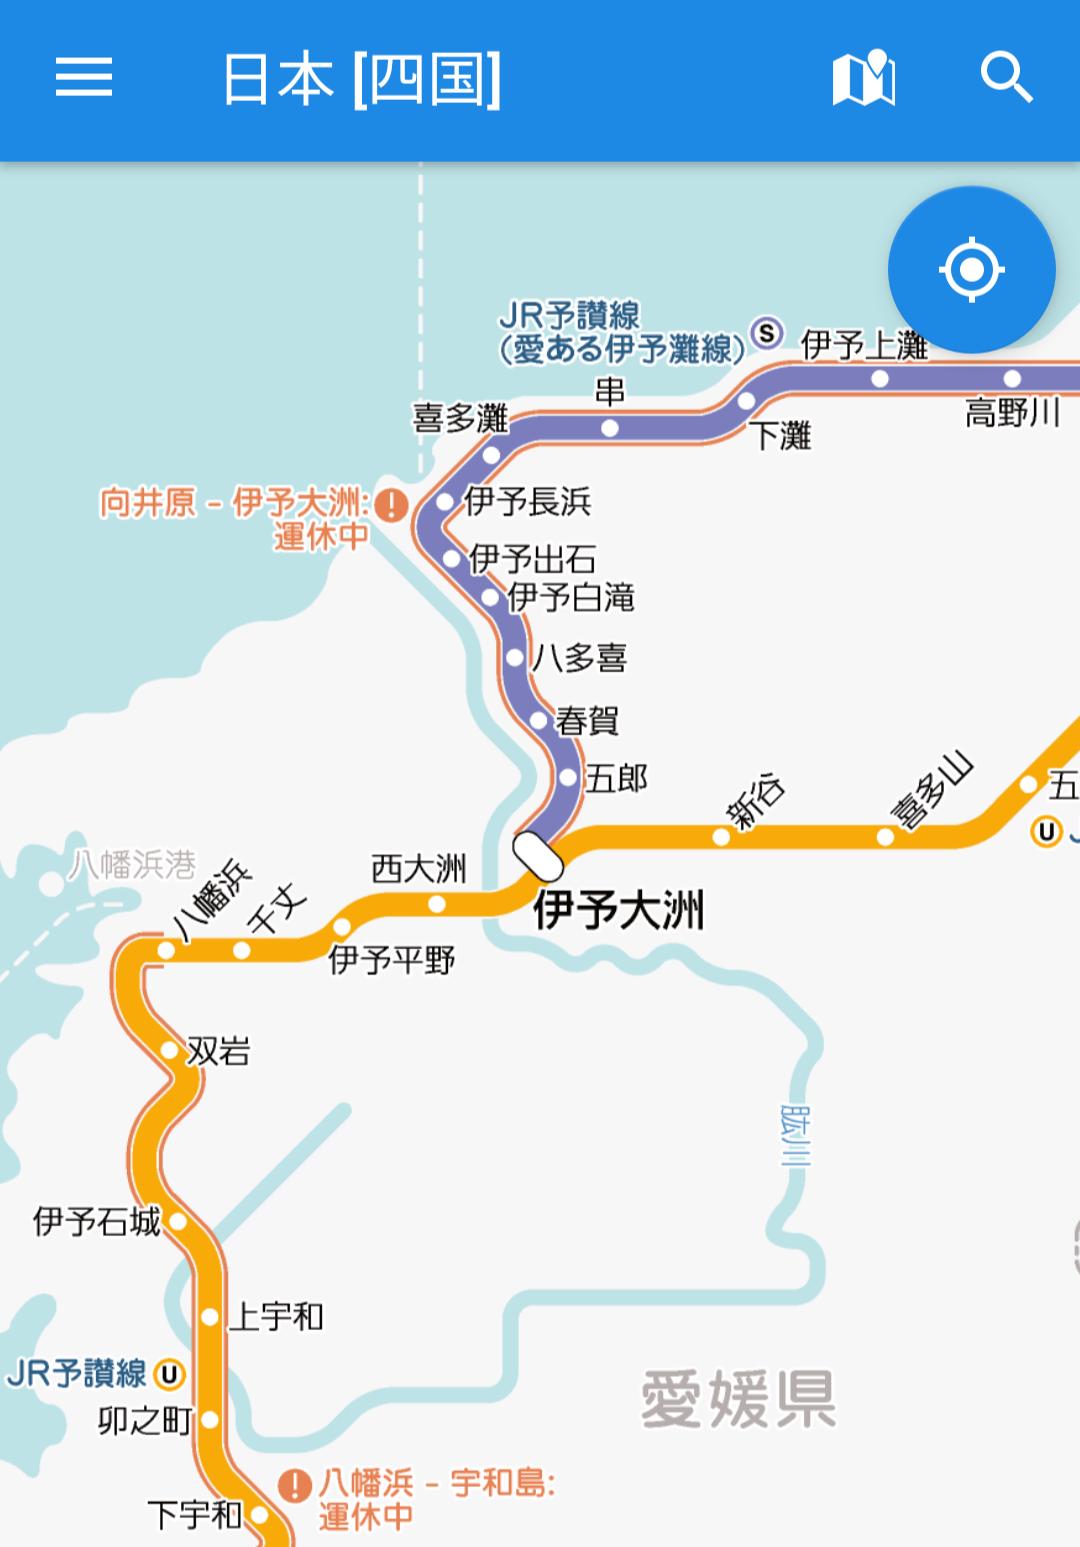 JR予讃線の伊予市〜八幡浜駅間(山回り)が運転再開